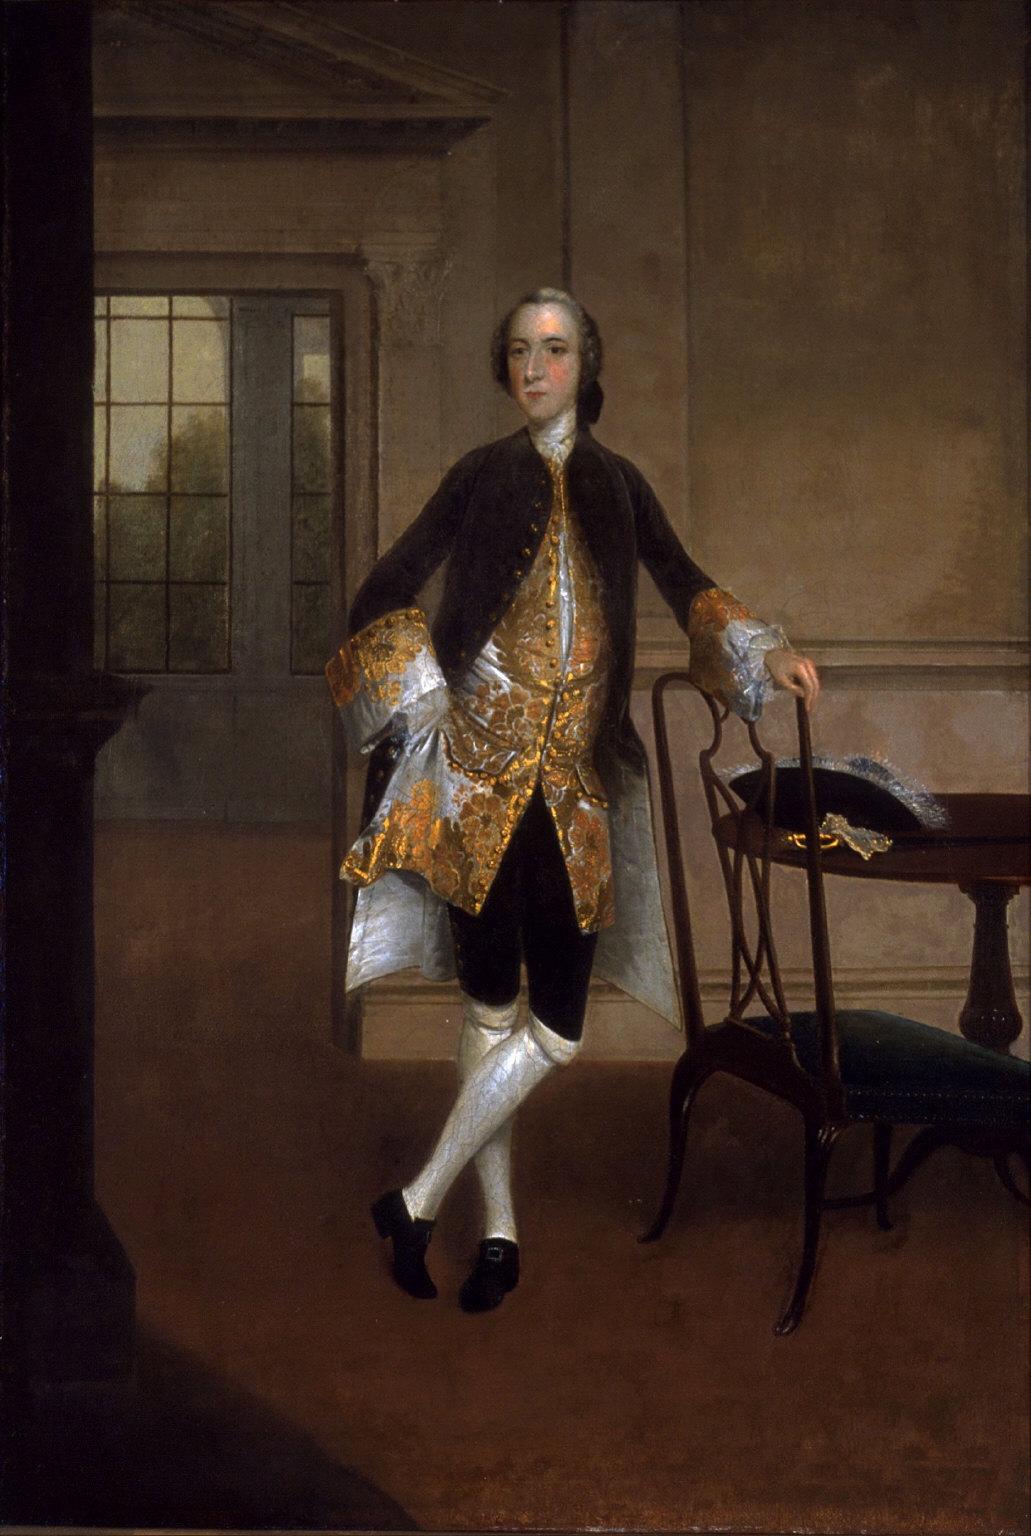 Earl of Tyrconnel